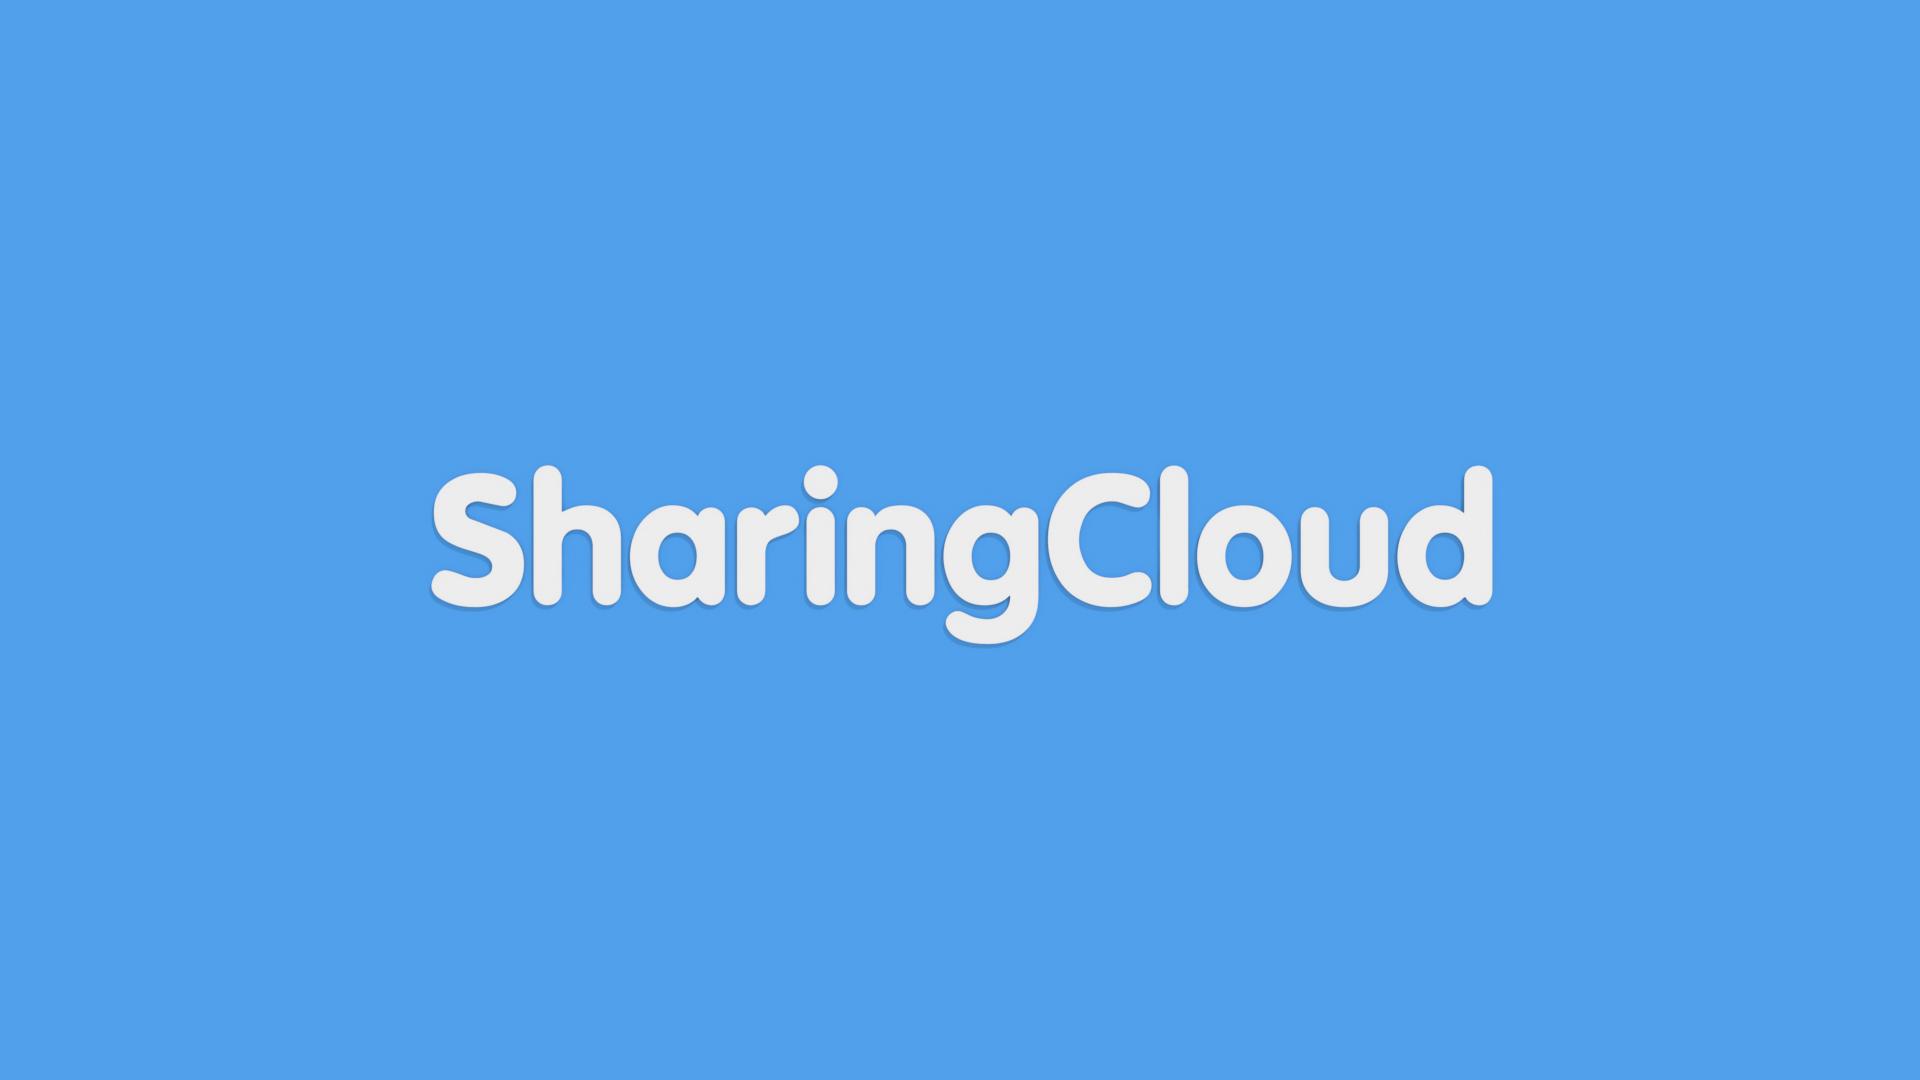 SHARING_CLOUD_04